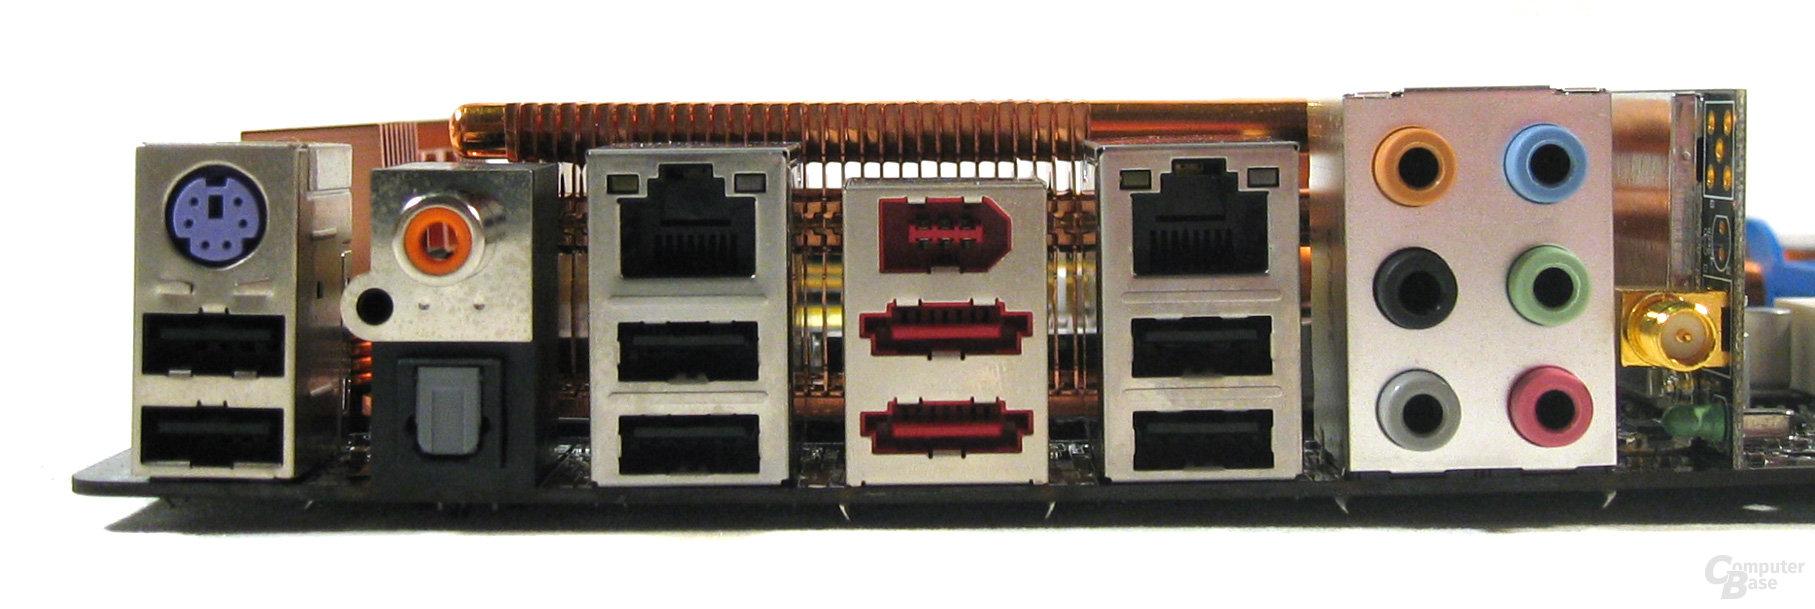 Asus P5K Deluxe ATX-Blende